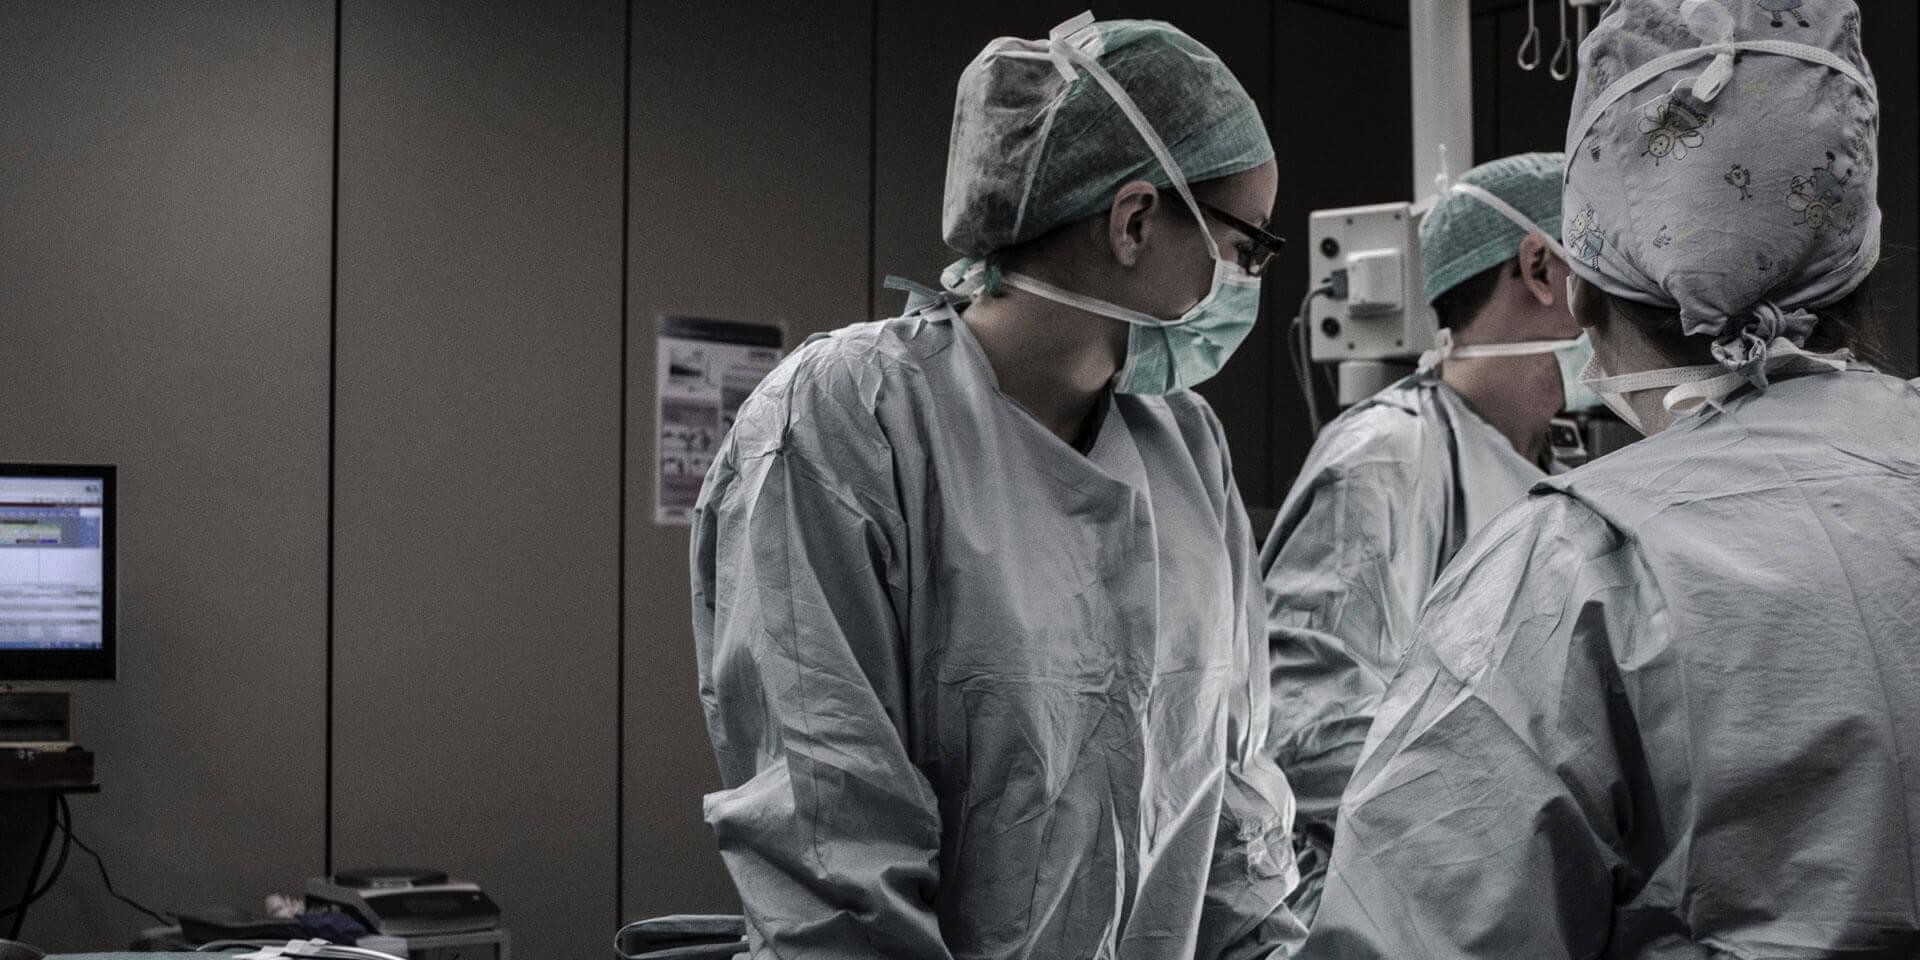 figure6 Cirujano en lazaro cardenas